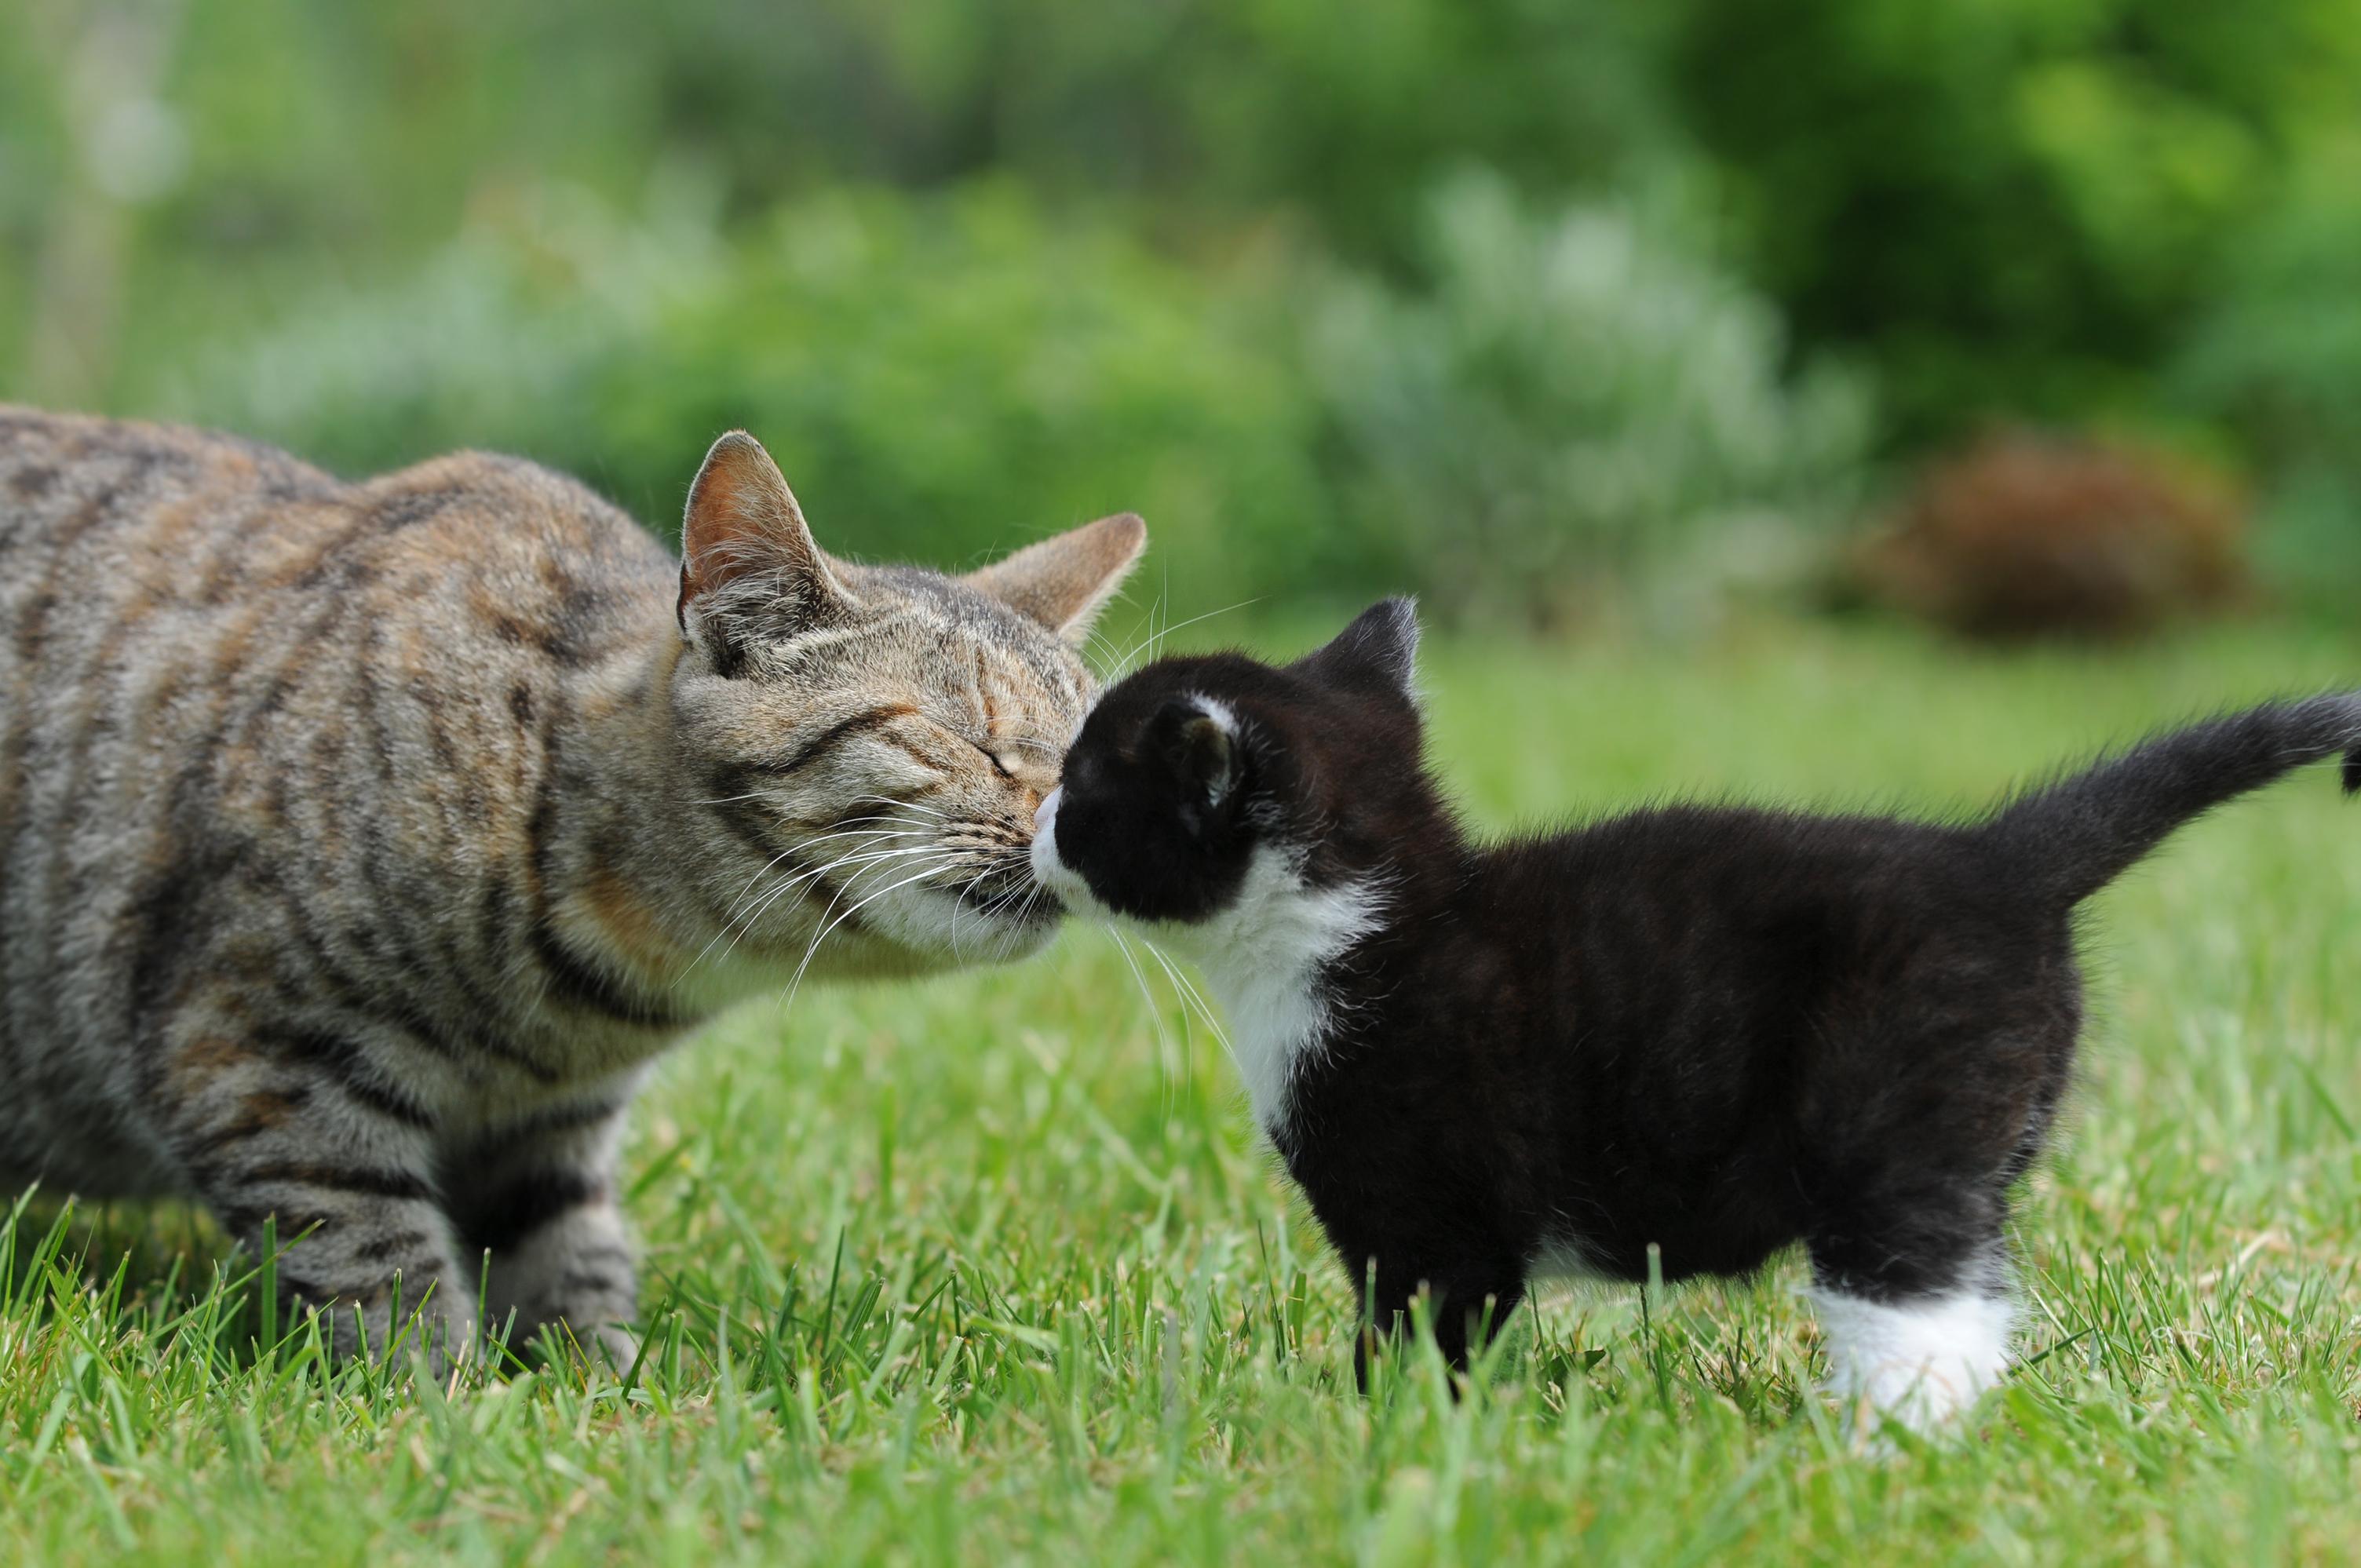 tamara - kitten kissing mother